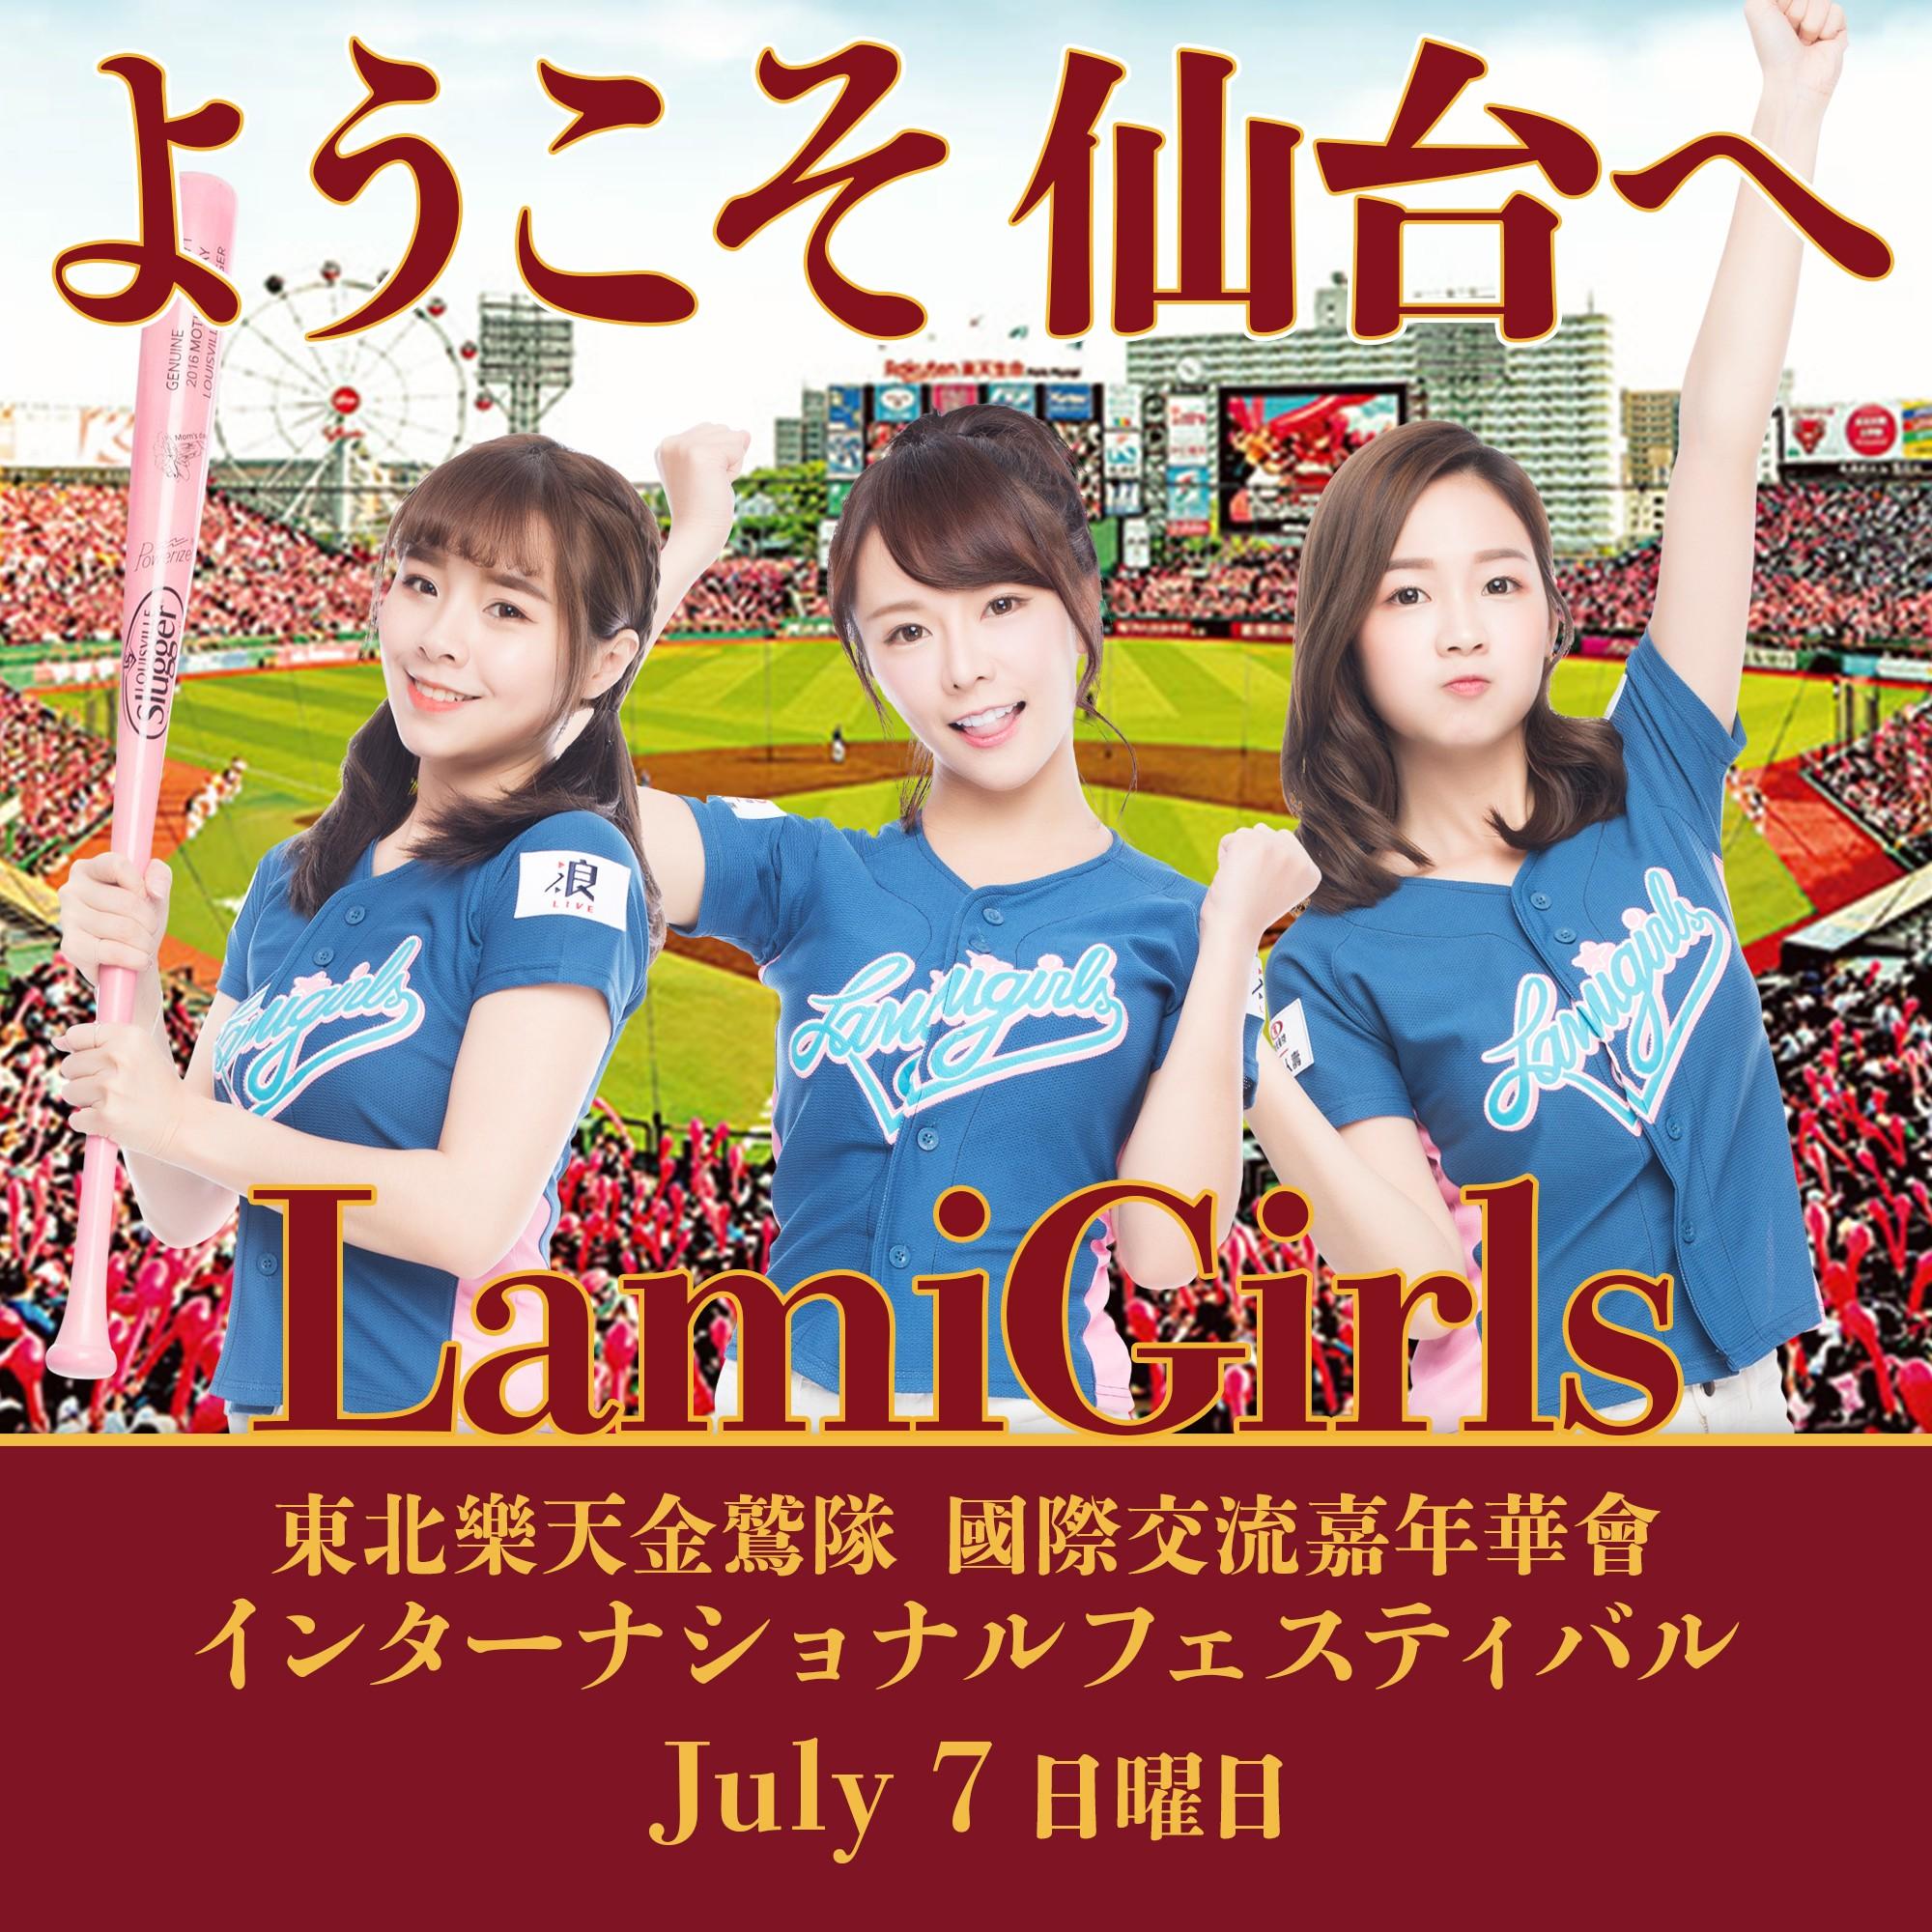 LamiGirls 苡萱、籃籃與張庭受邀參加東北樂天金鷲國際日